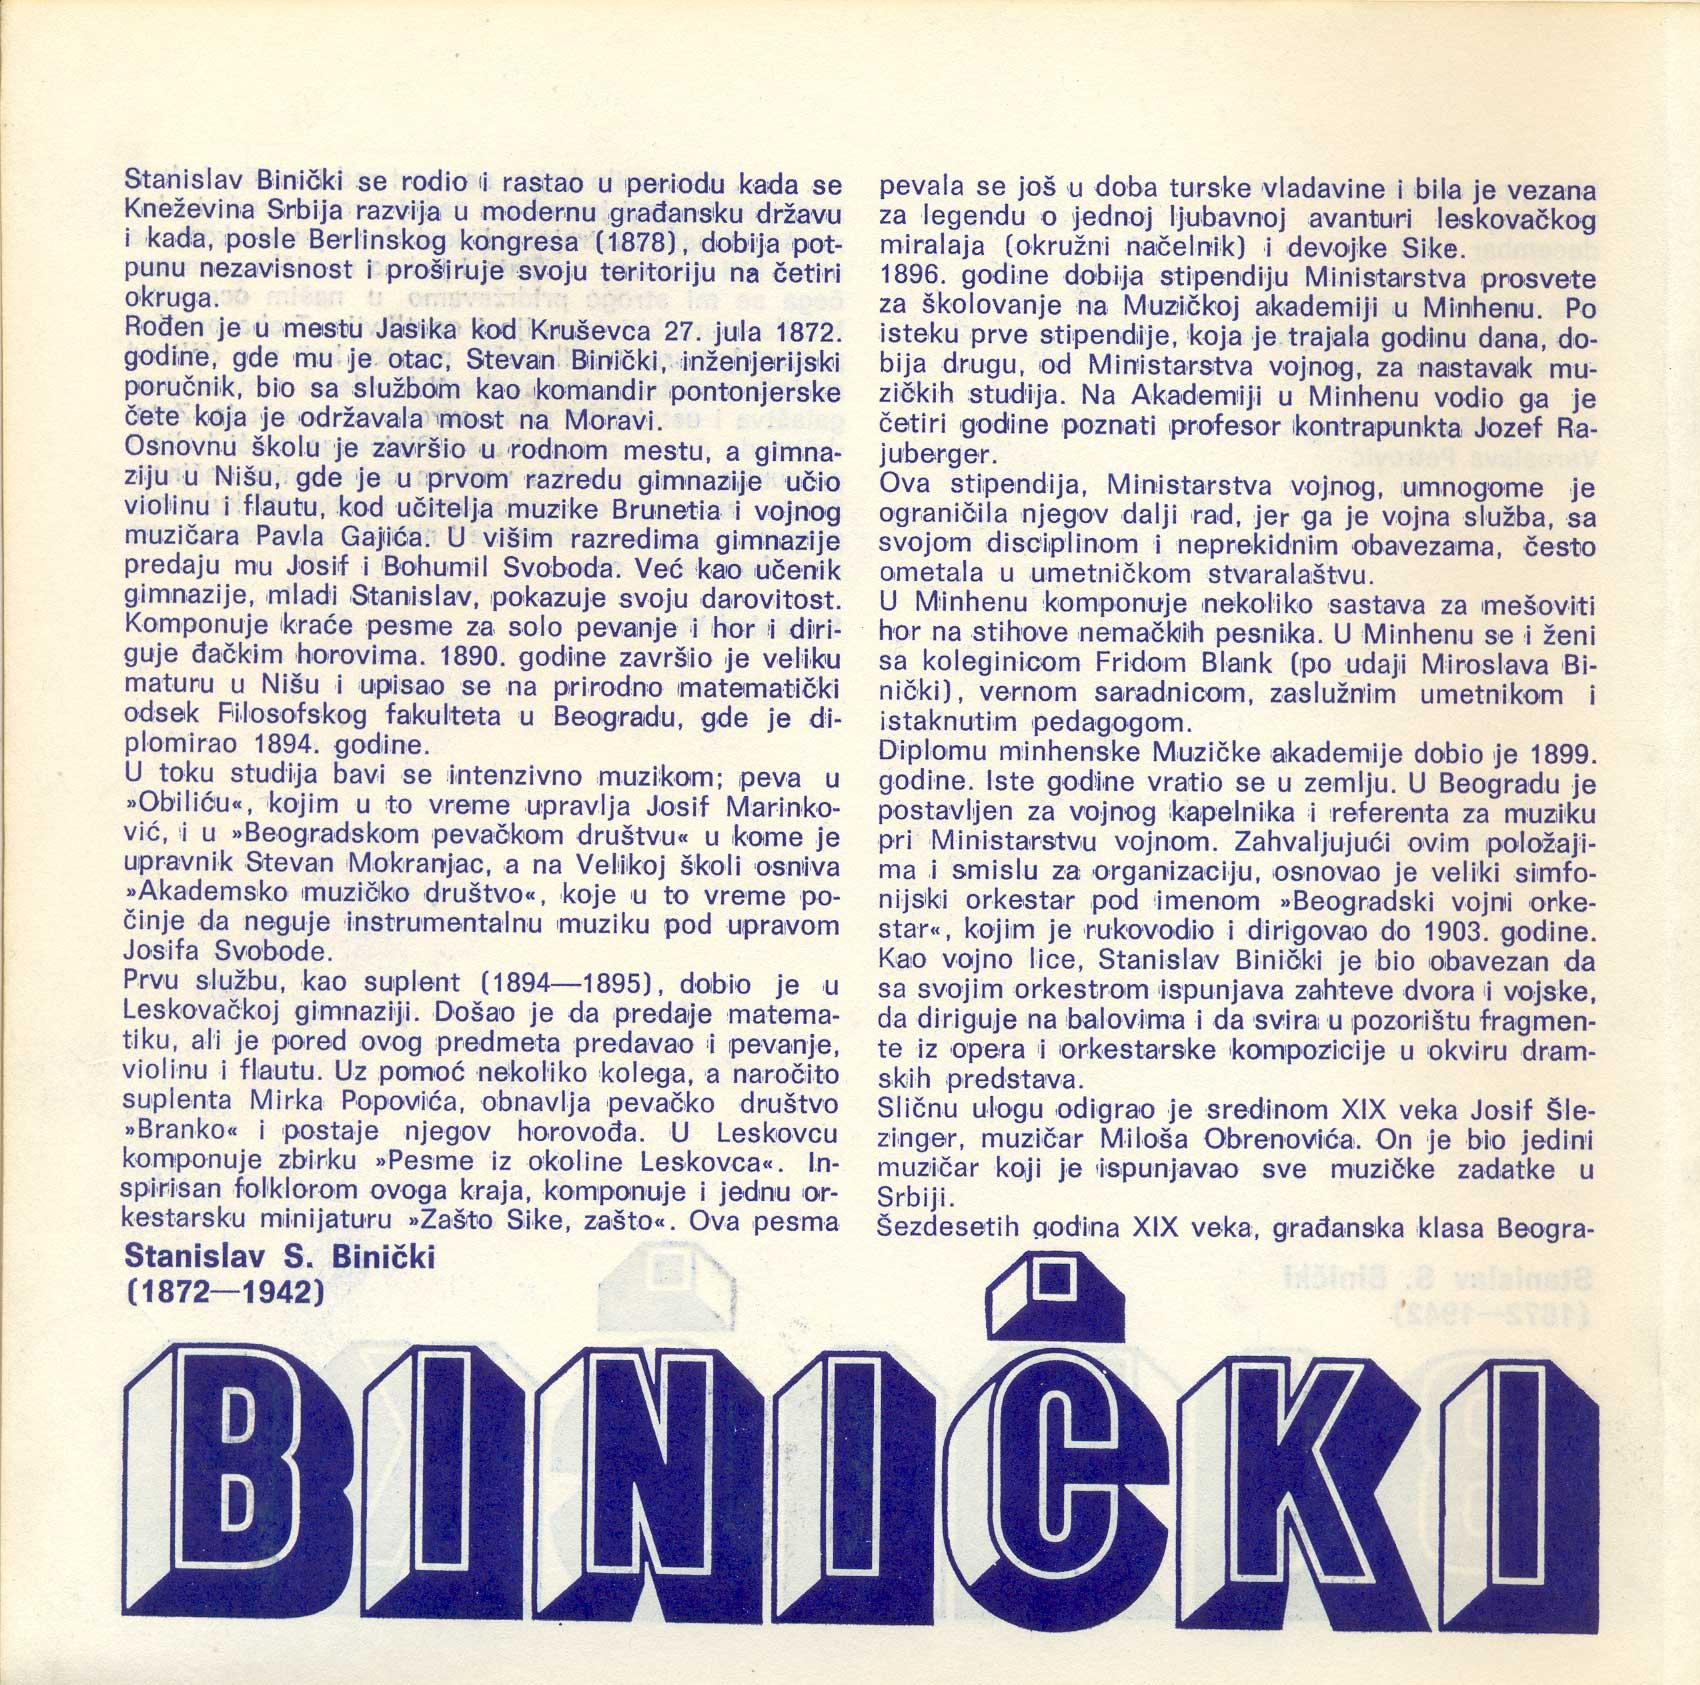 stanislav-binicki-katalog-1973-03